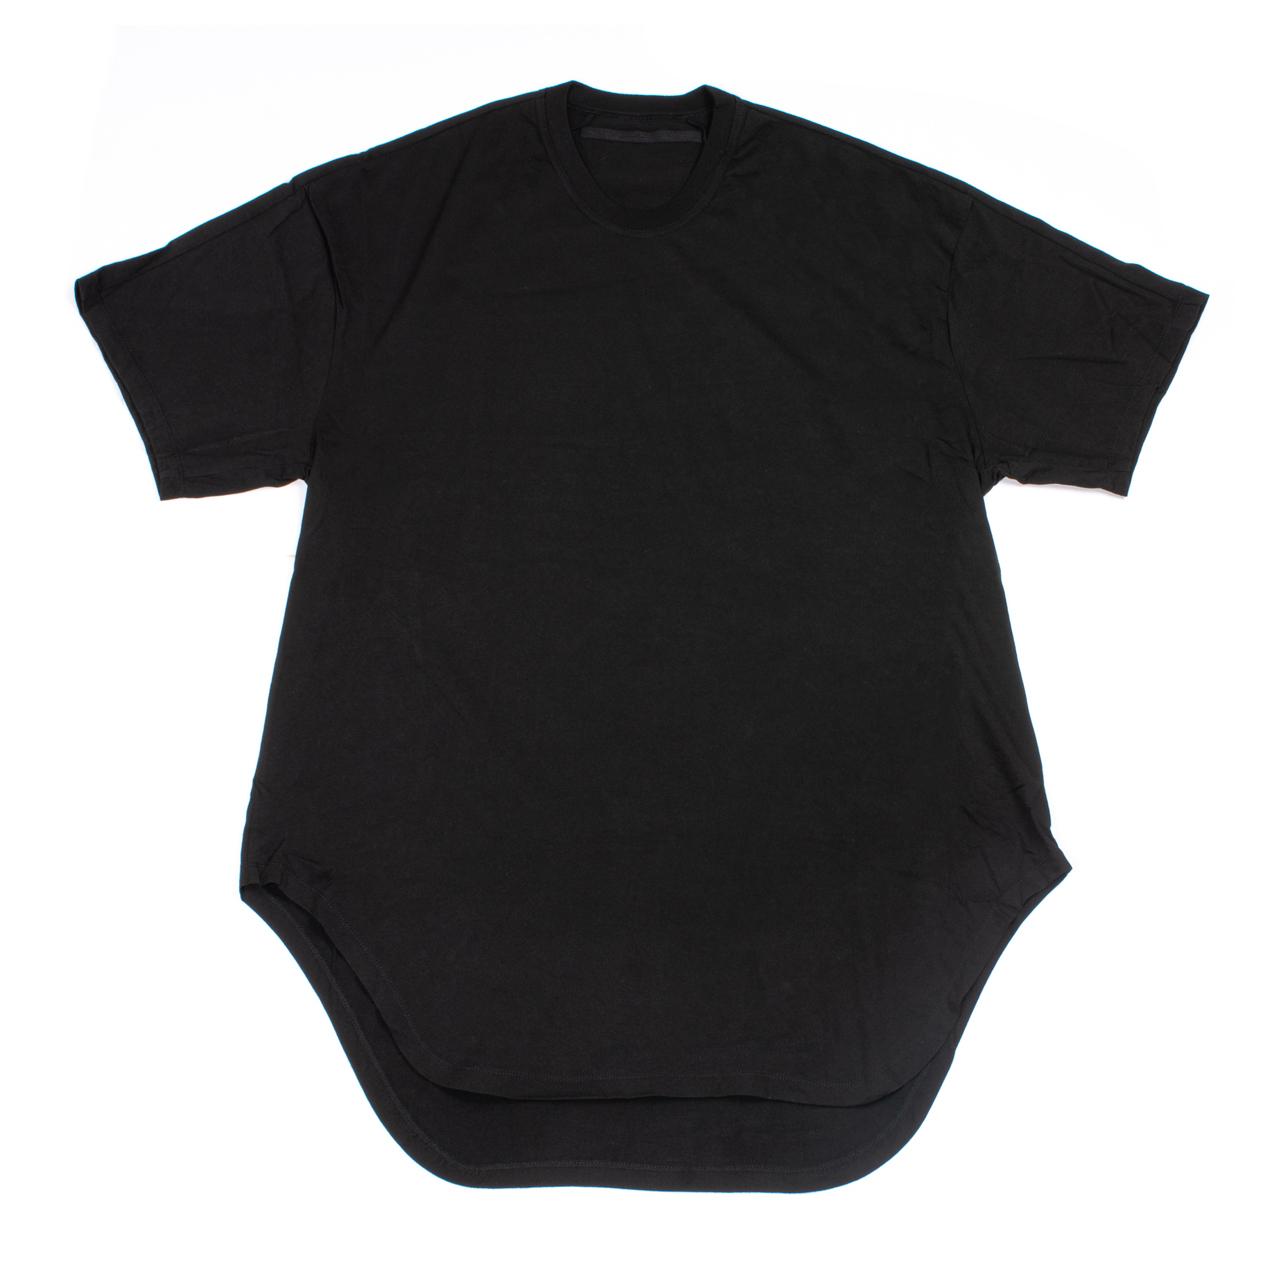 727CUM7-BLACK / オーバーサイズ Tシャツ